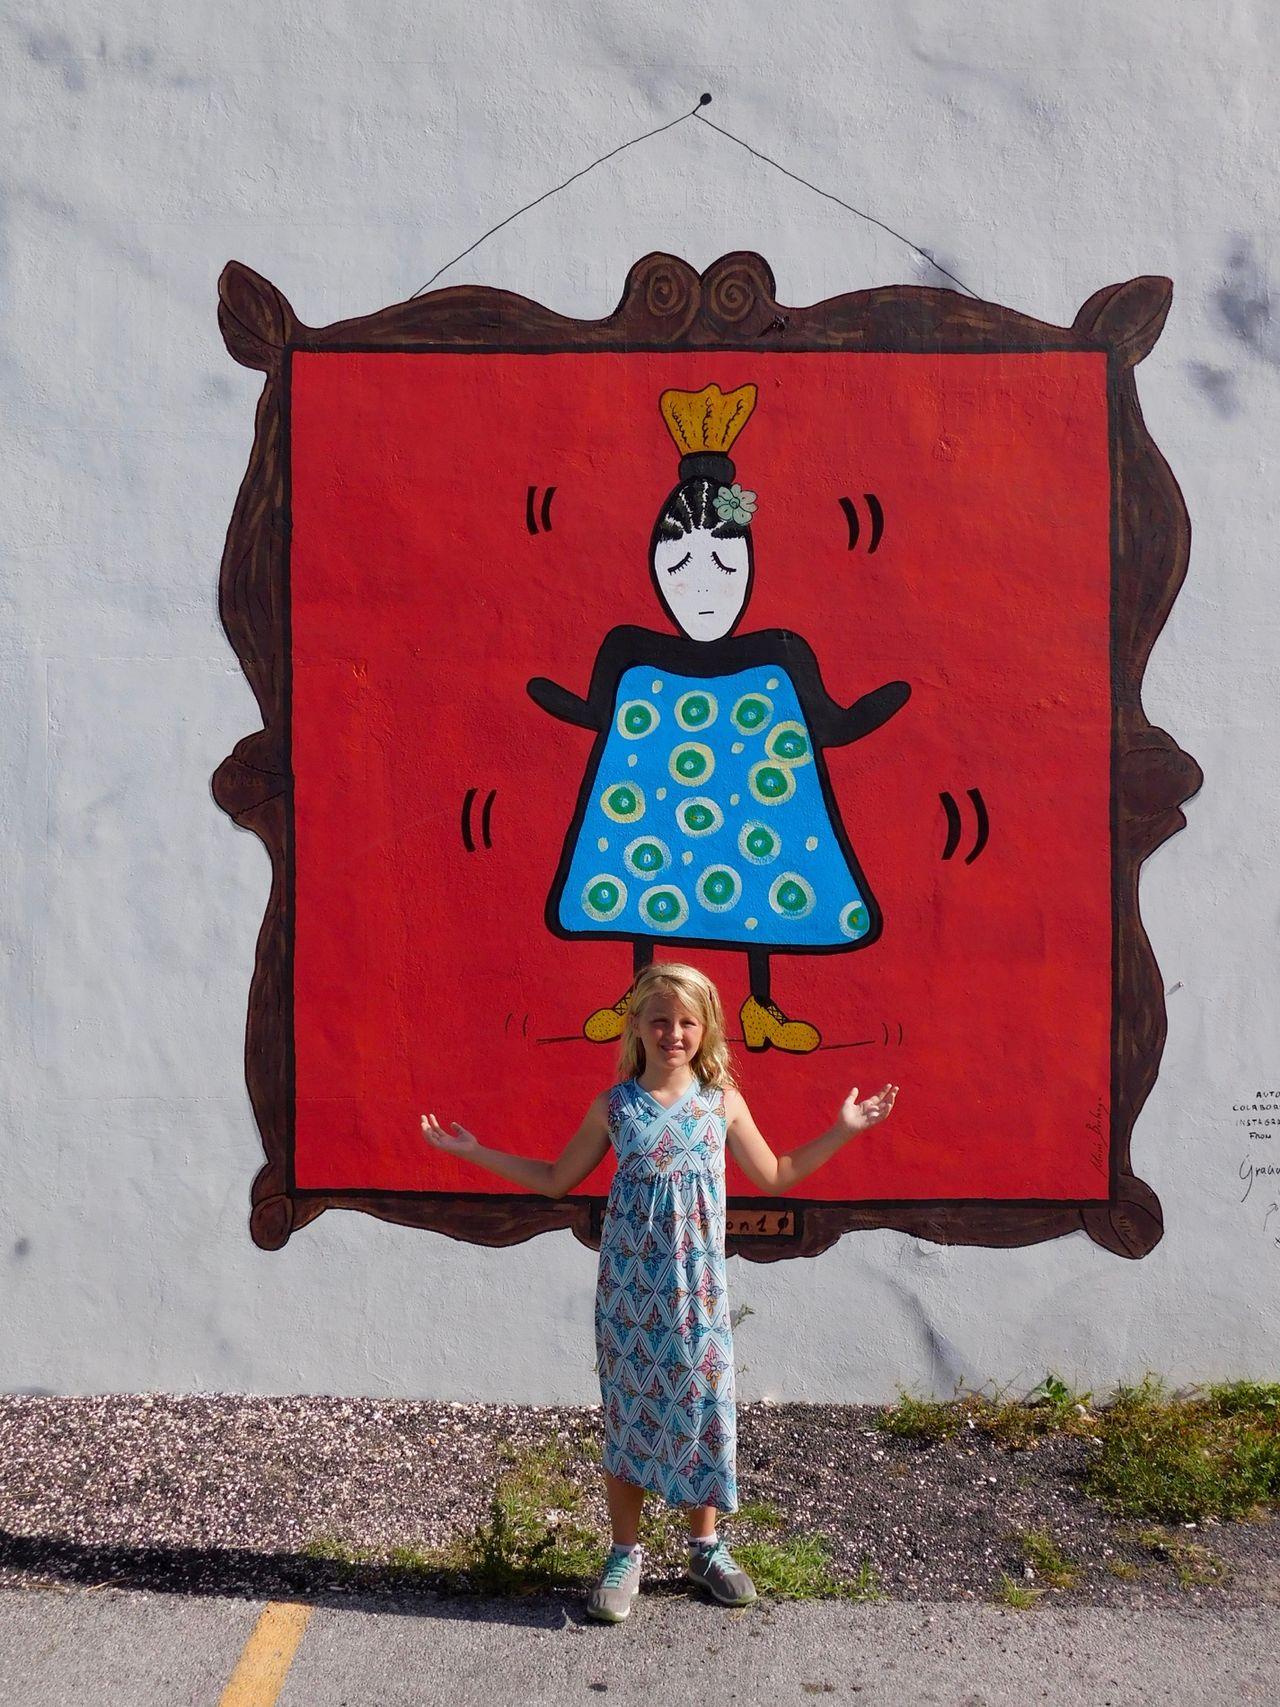 Peintures murales au Wynwood Art District de Miami.